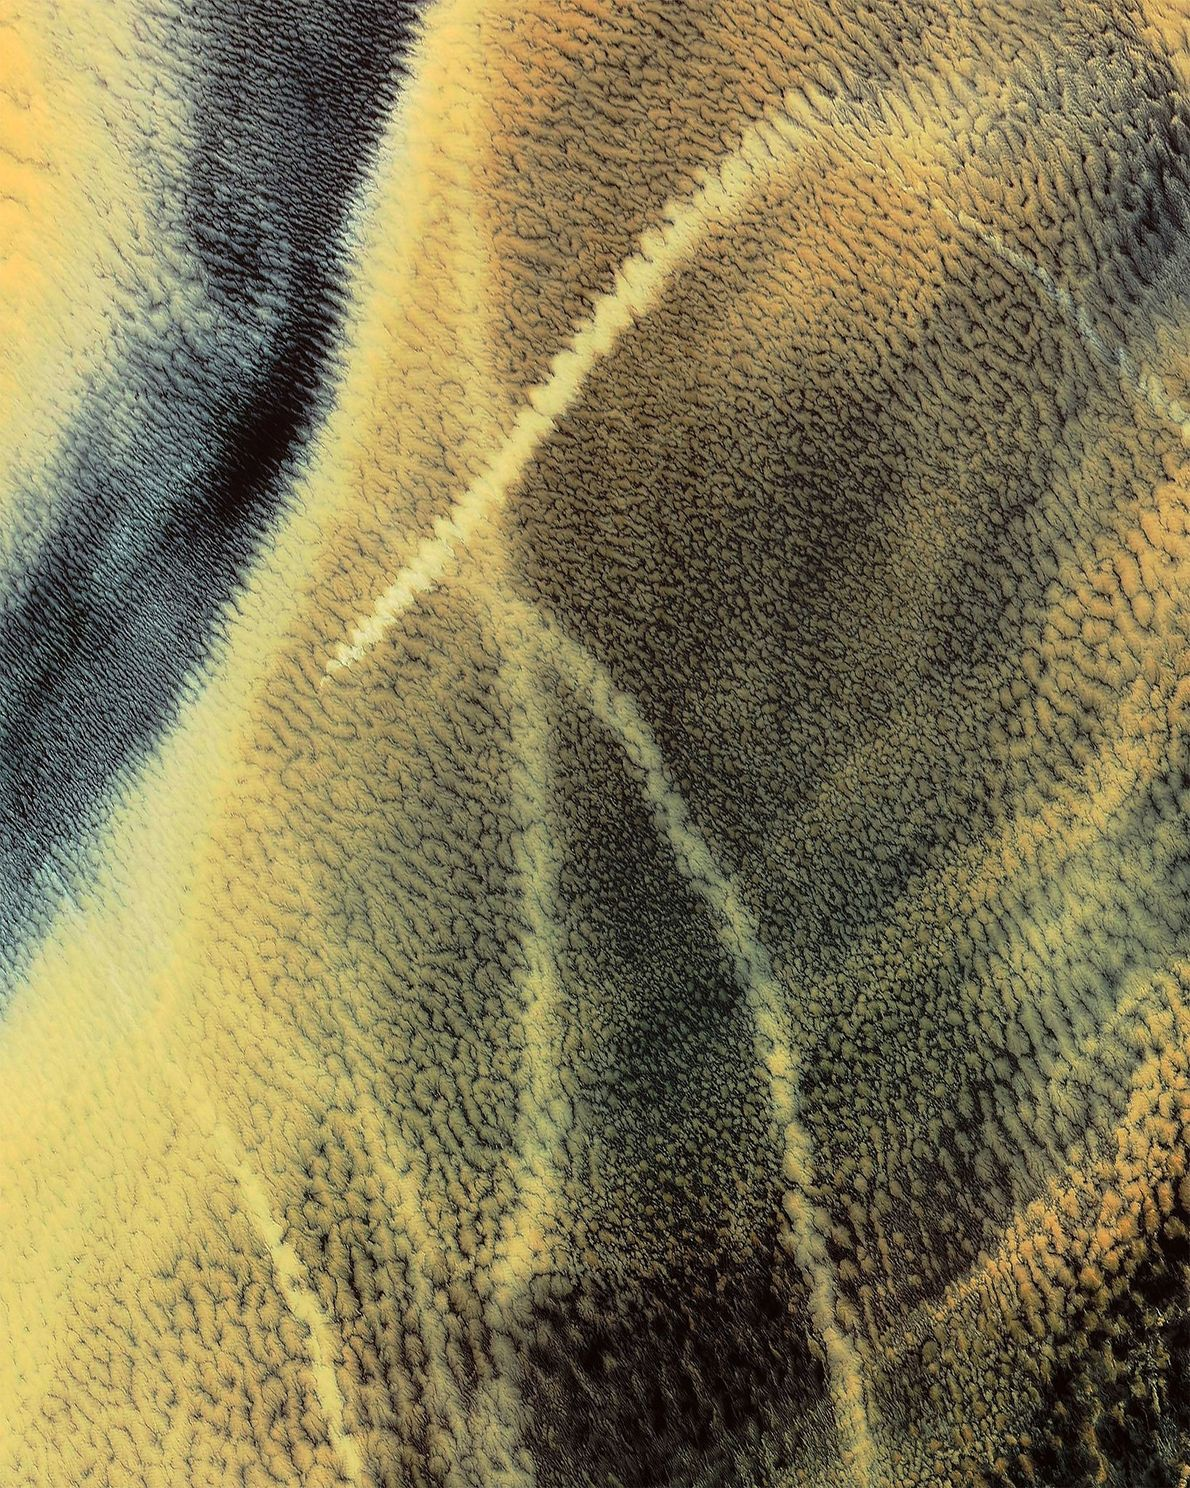 letras-alfabeto-imagens-satelite